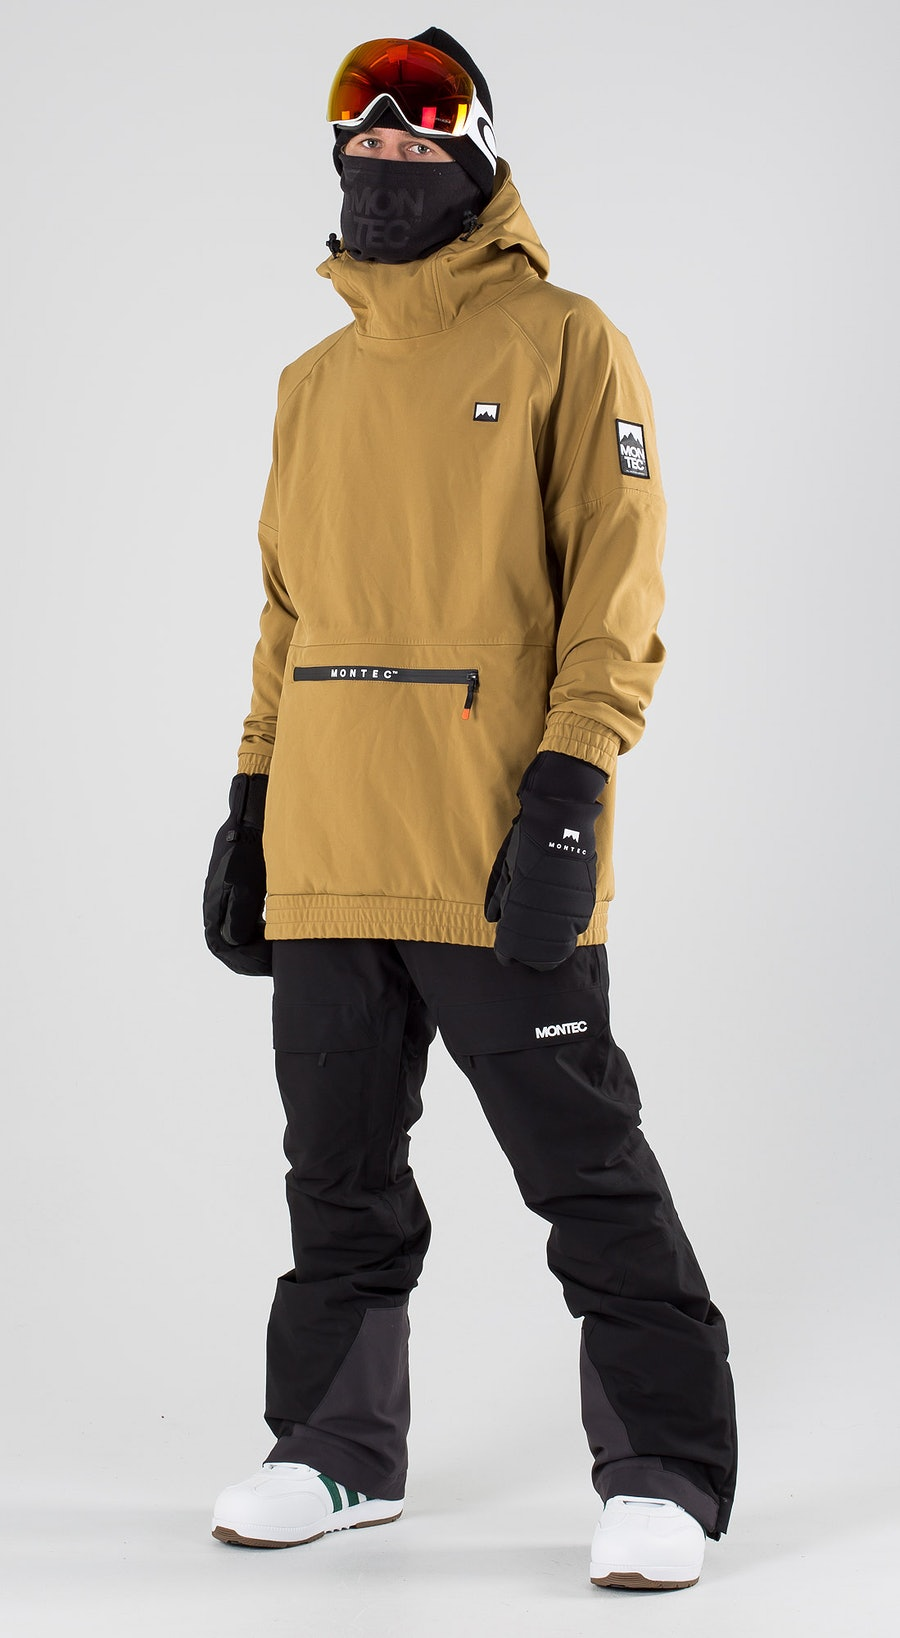 Montec Tempest Gold Snowboardkläder Multi